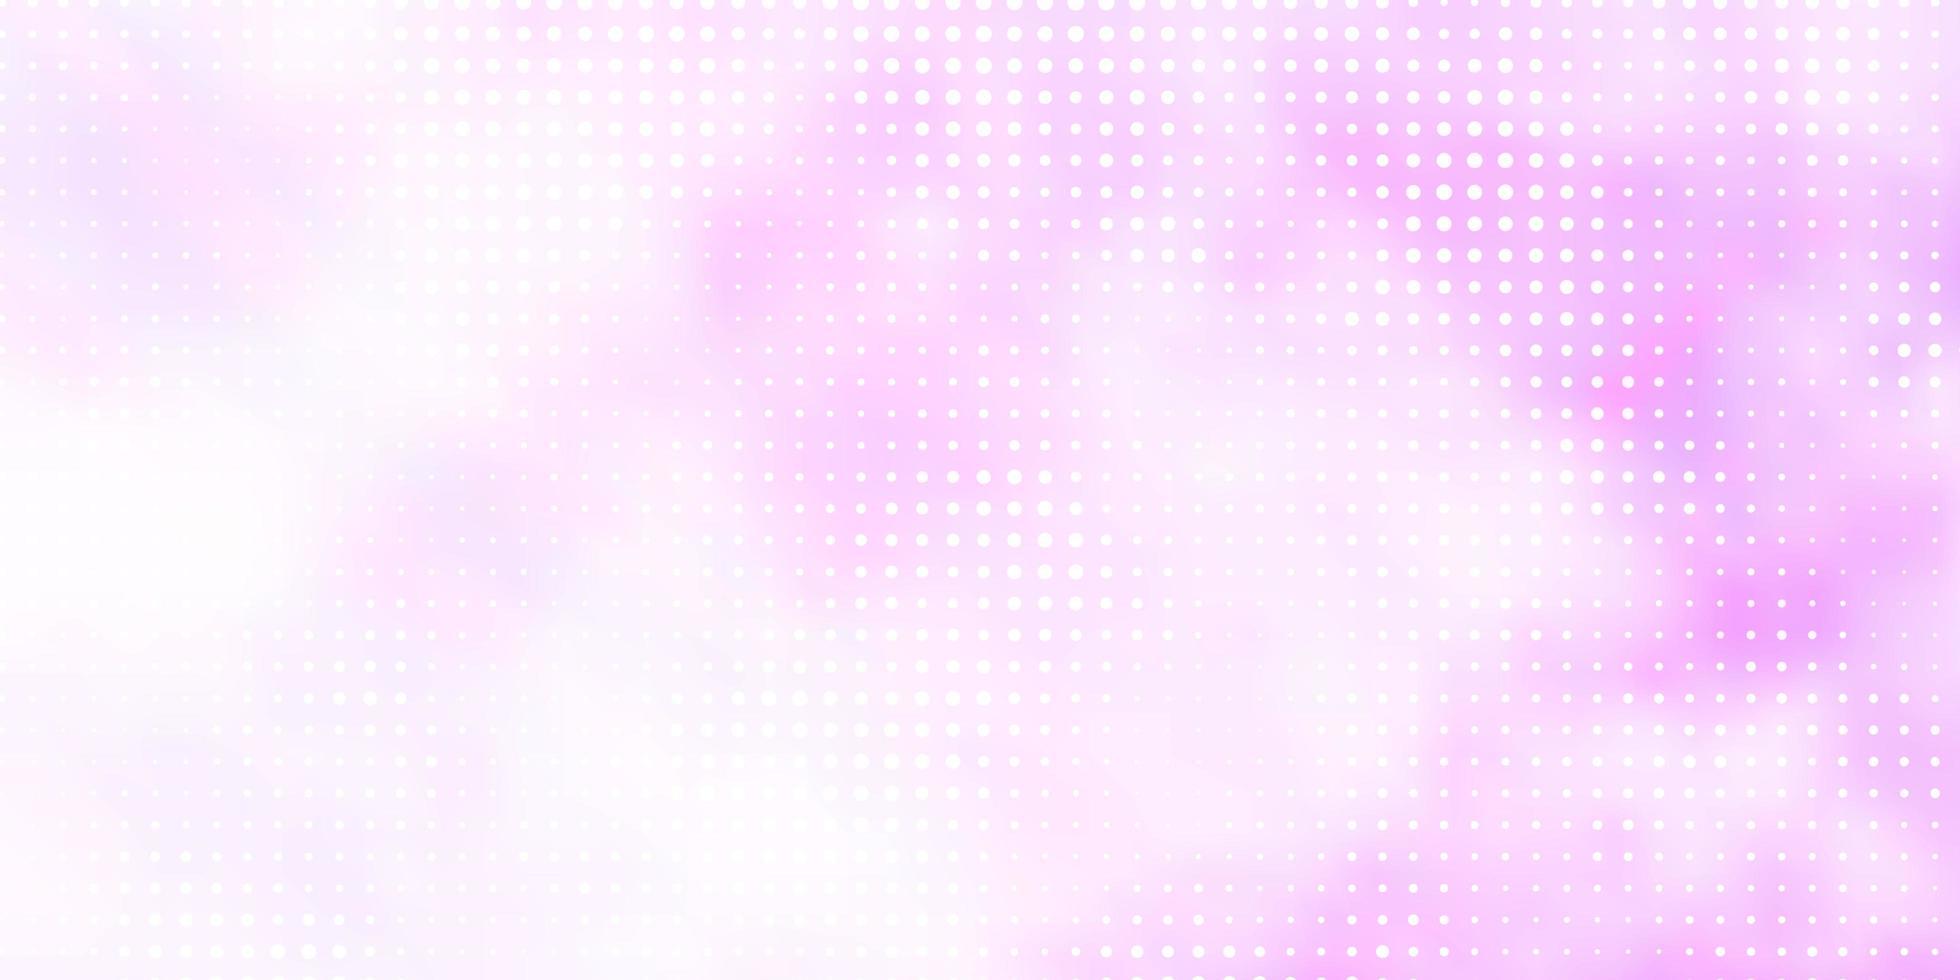 hellviolette Vektorschablone mit Kreisen. vektor